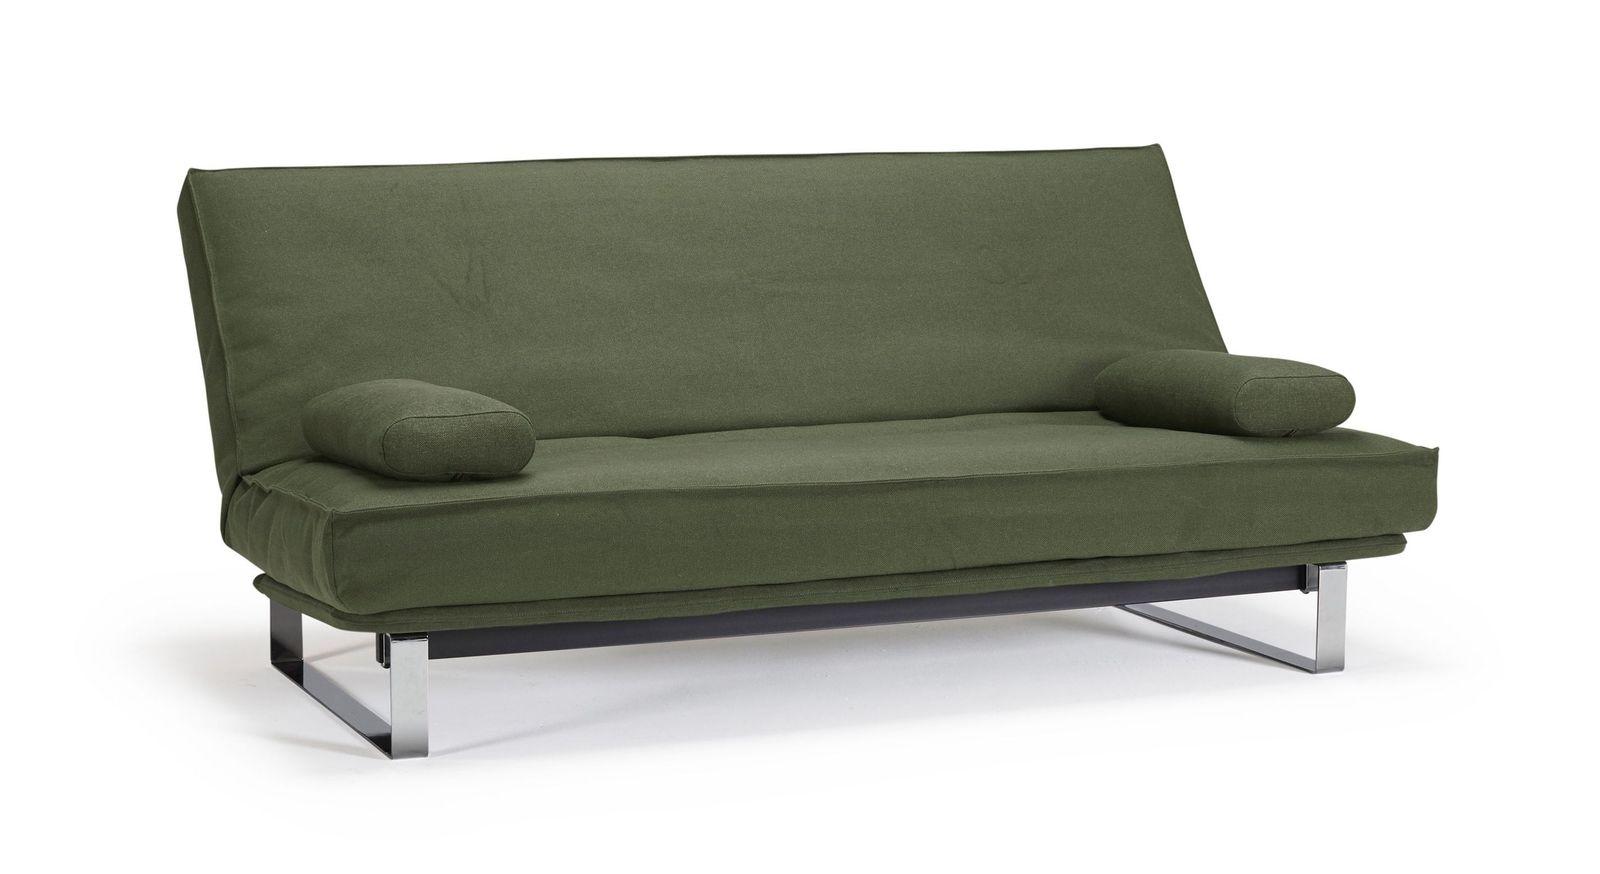 Schlafsofa Perano mit dunkelgrünem Twist-Bezug